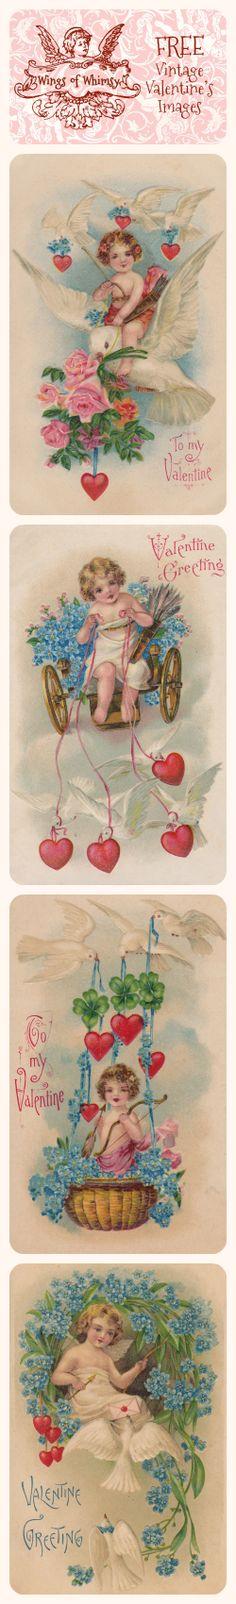 Wings of Whimsy: Vintage Valentine's Images - free for personal use #vintage #ephemera #valentine #printable #freebie